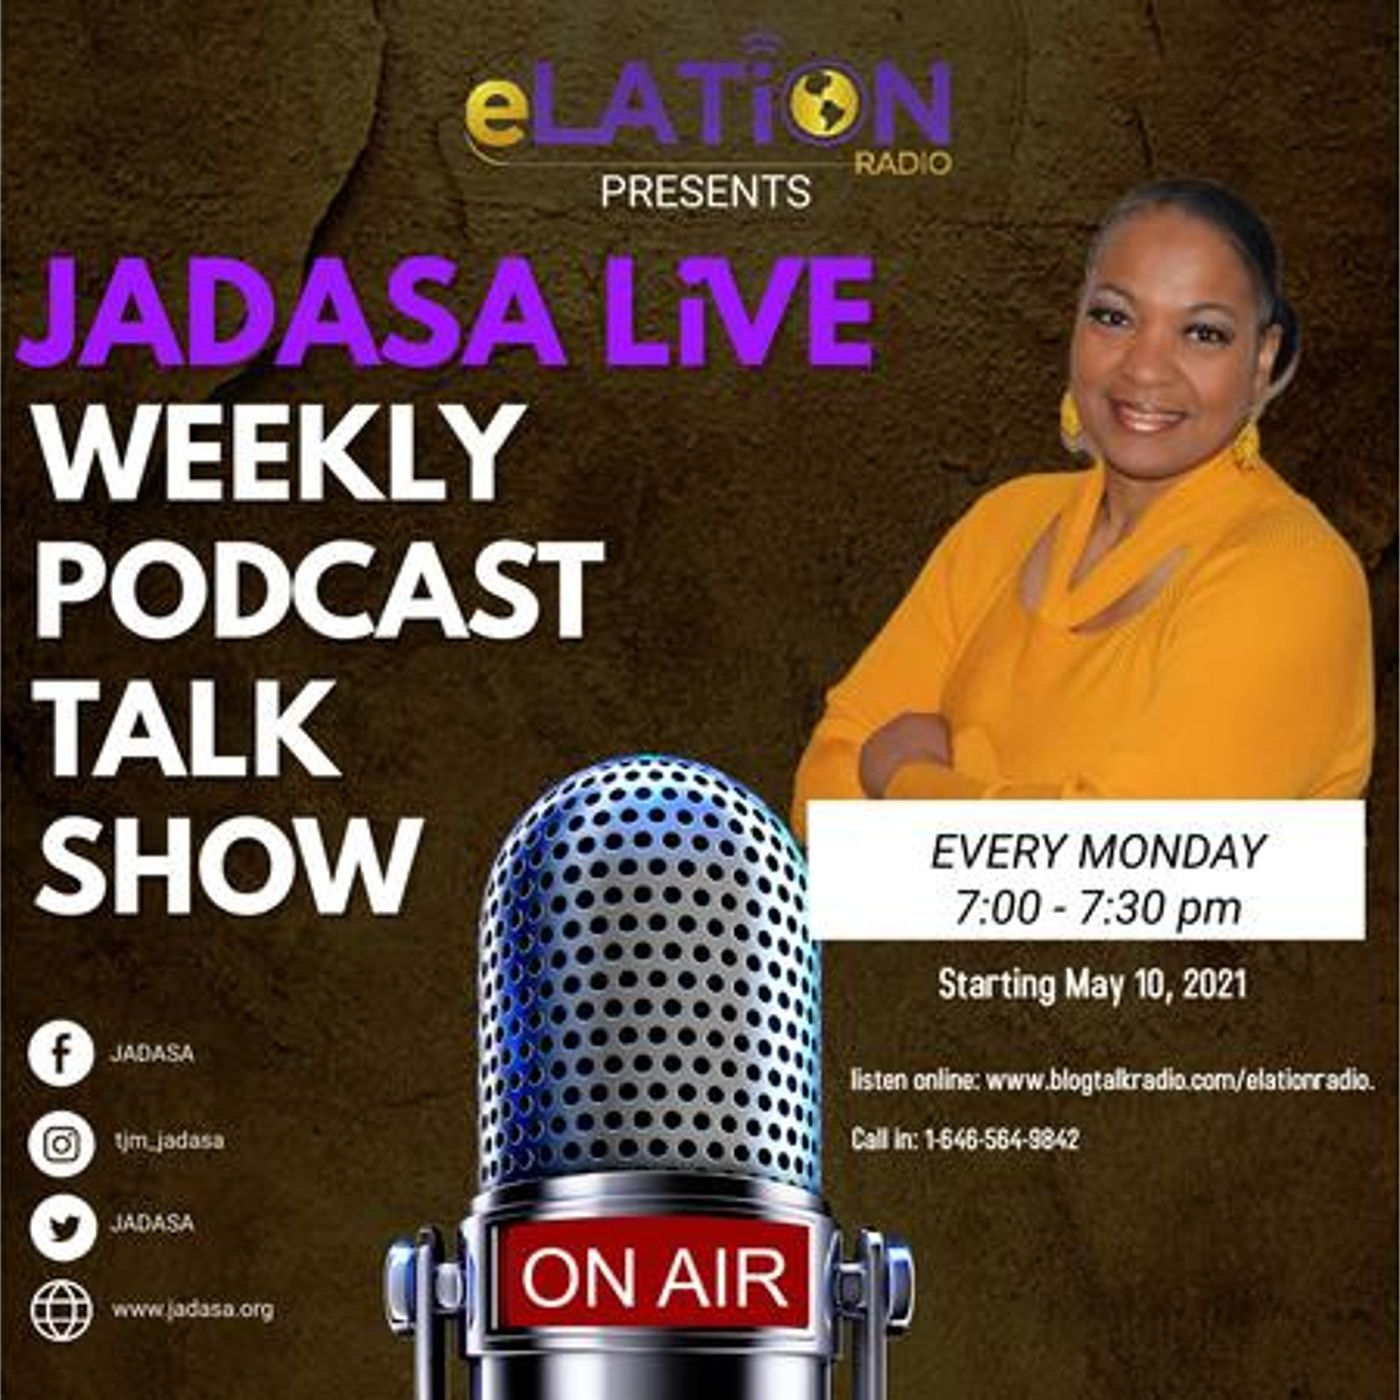 Jadasa Live with Cynthia